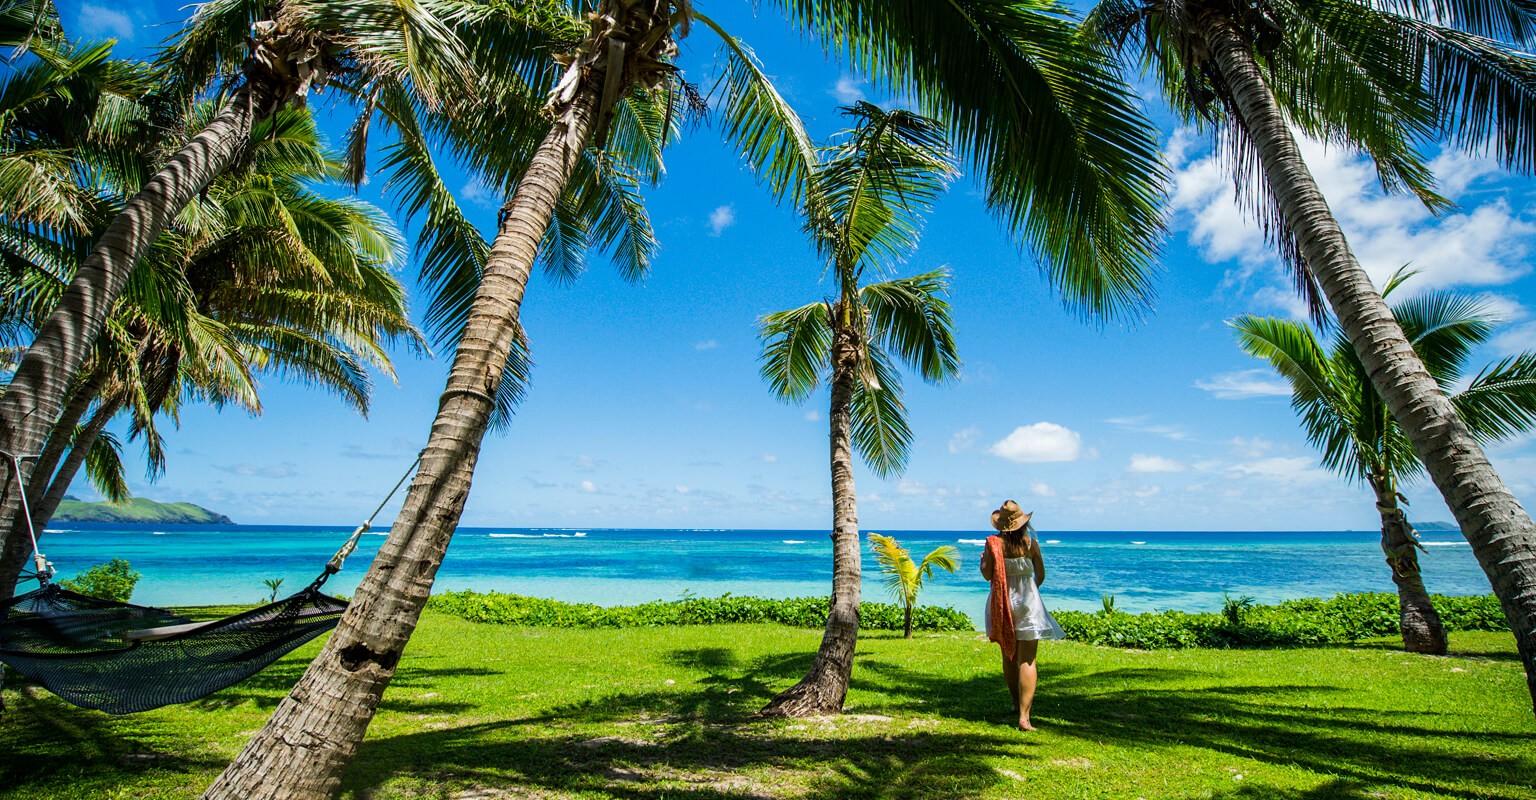 Tokoriki Island Resort Resort Fiji Islands Hammock Ocean